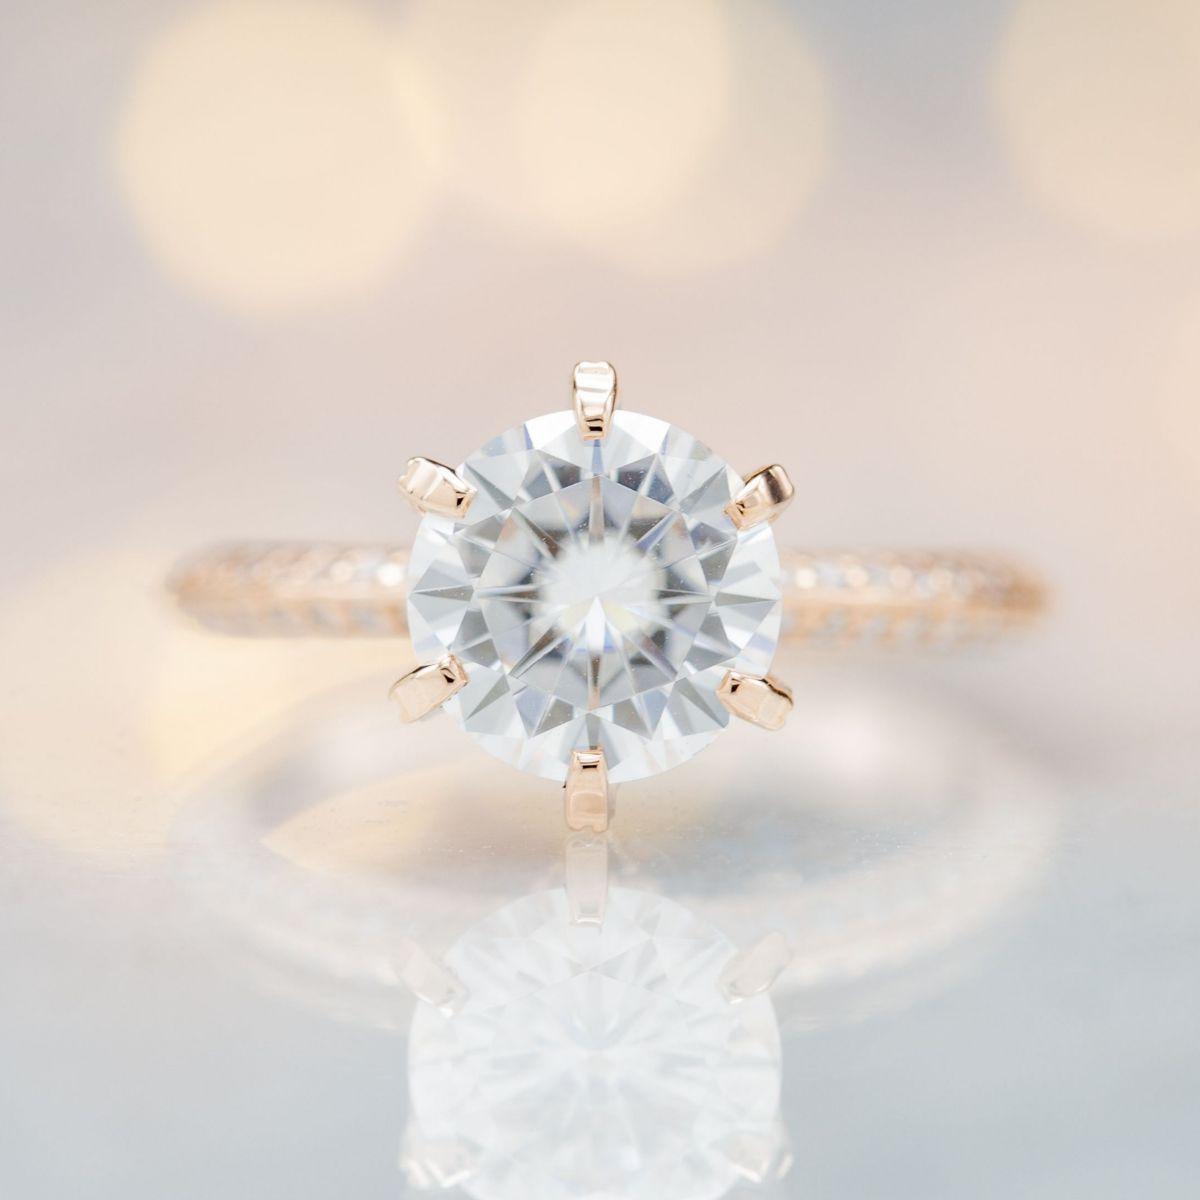 moissanite diamond alternative